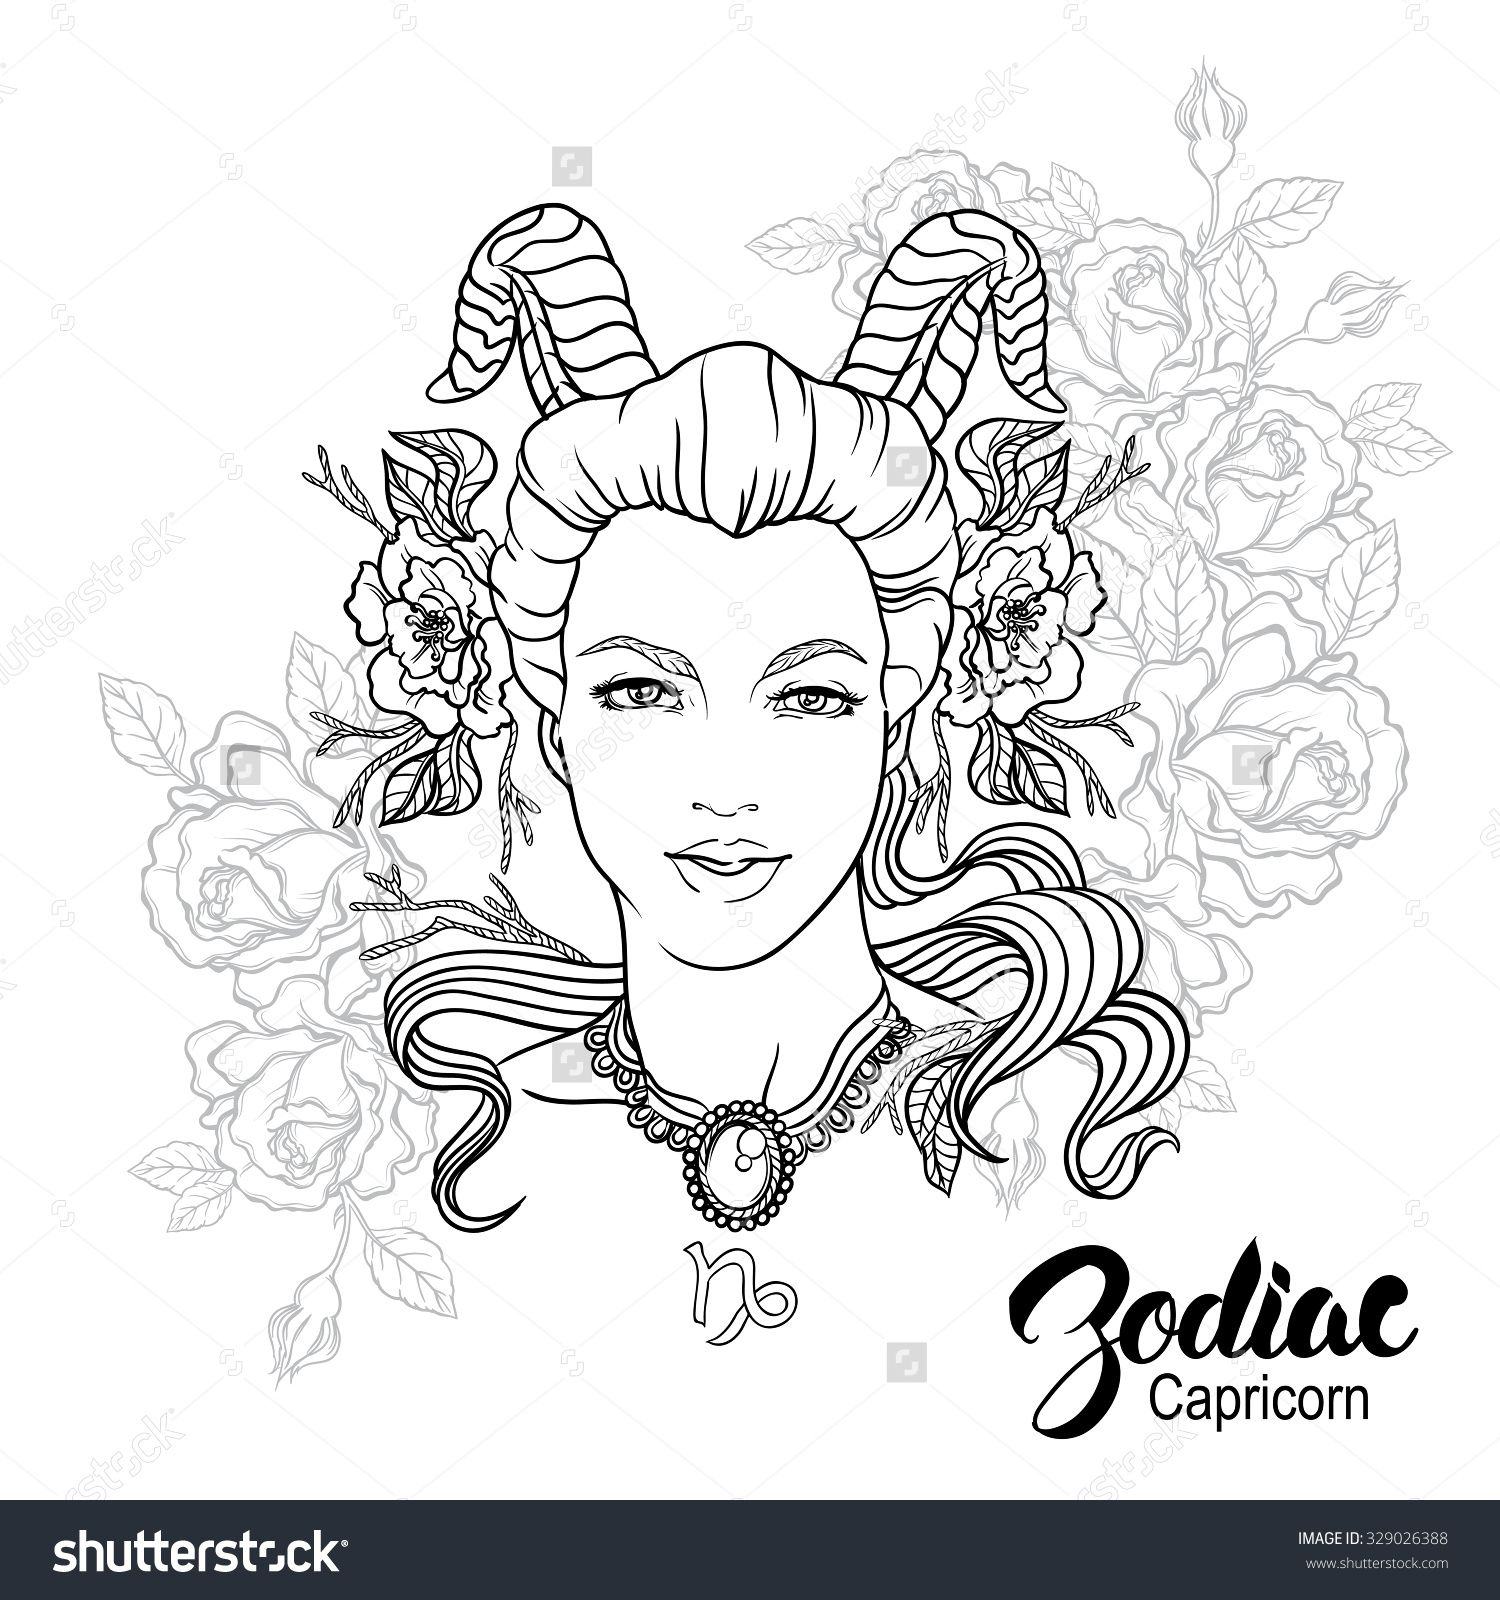 Zodiac Capricorn Girl Coloring Page Shutterstock 329026388